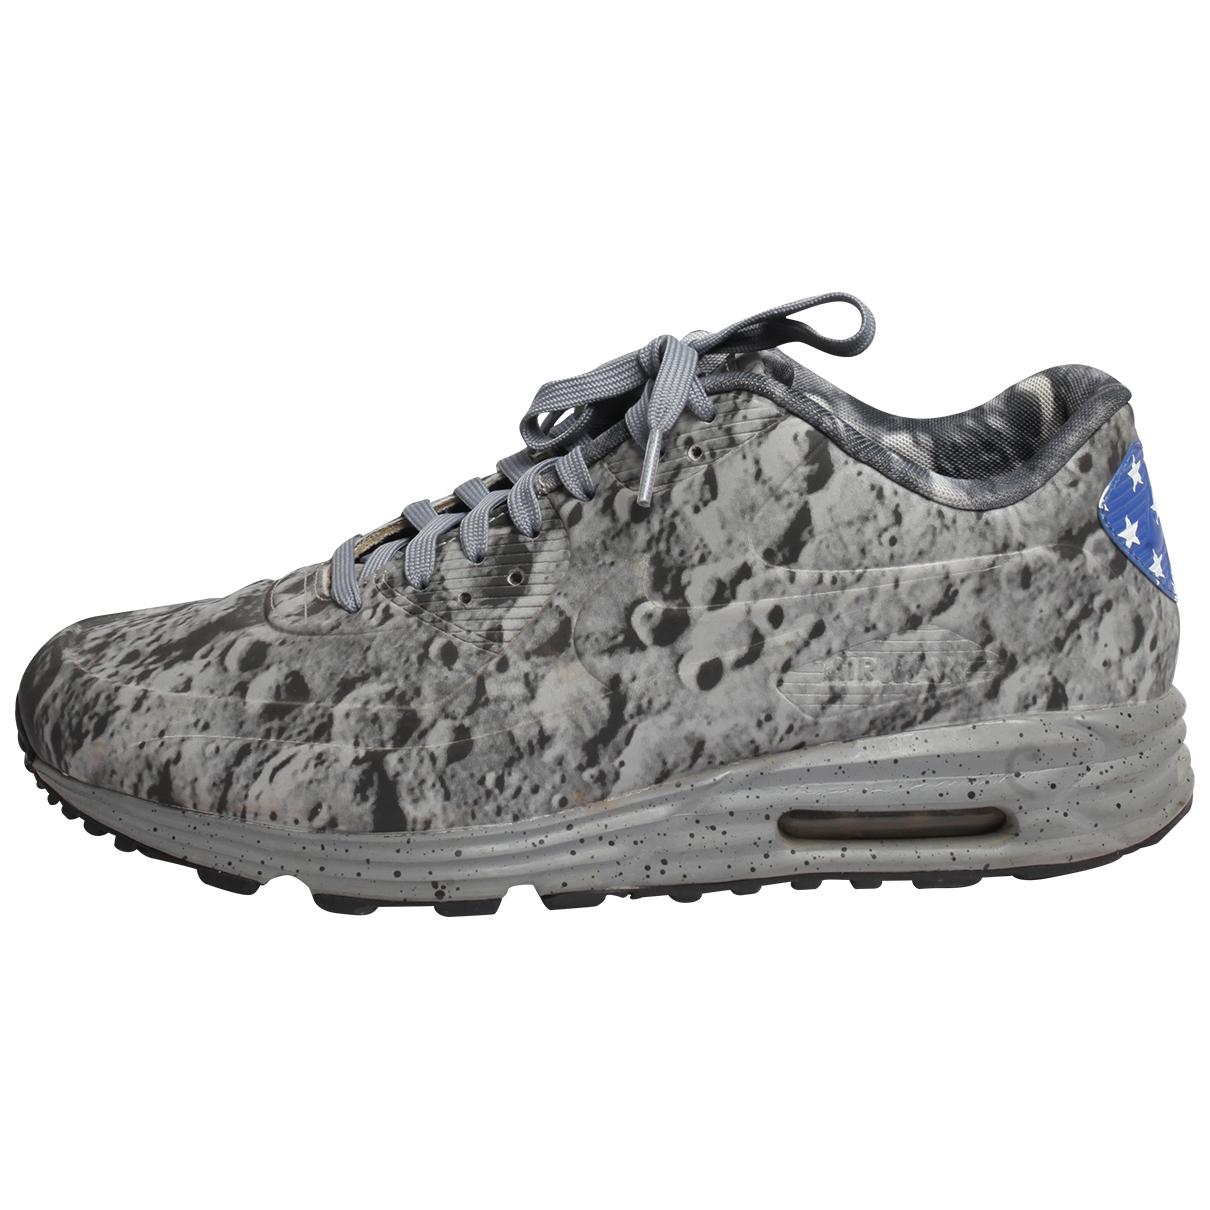 Nike - Baskets Air Max 90 pour homme